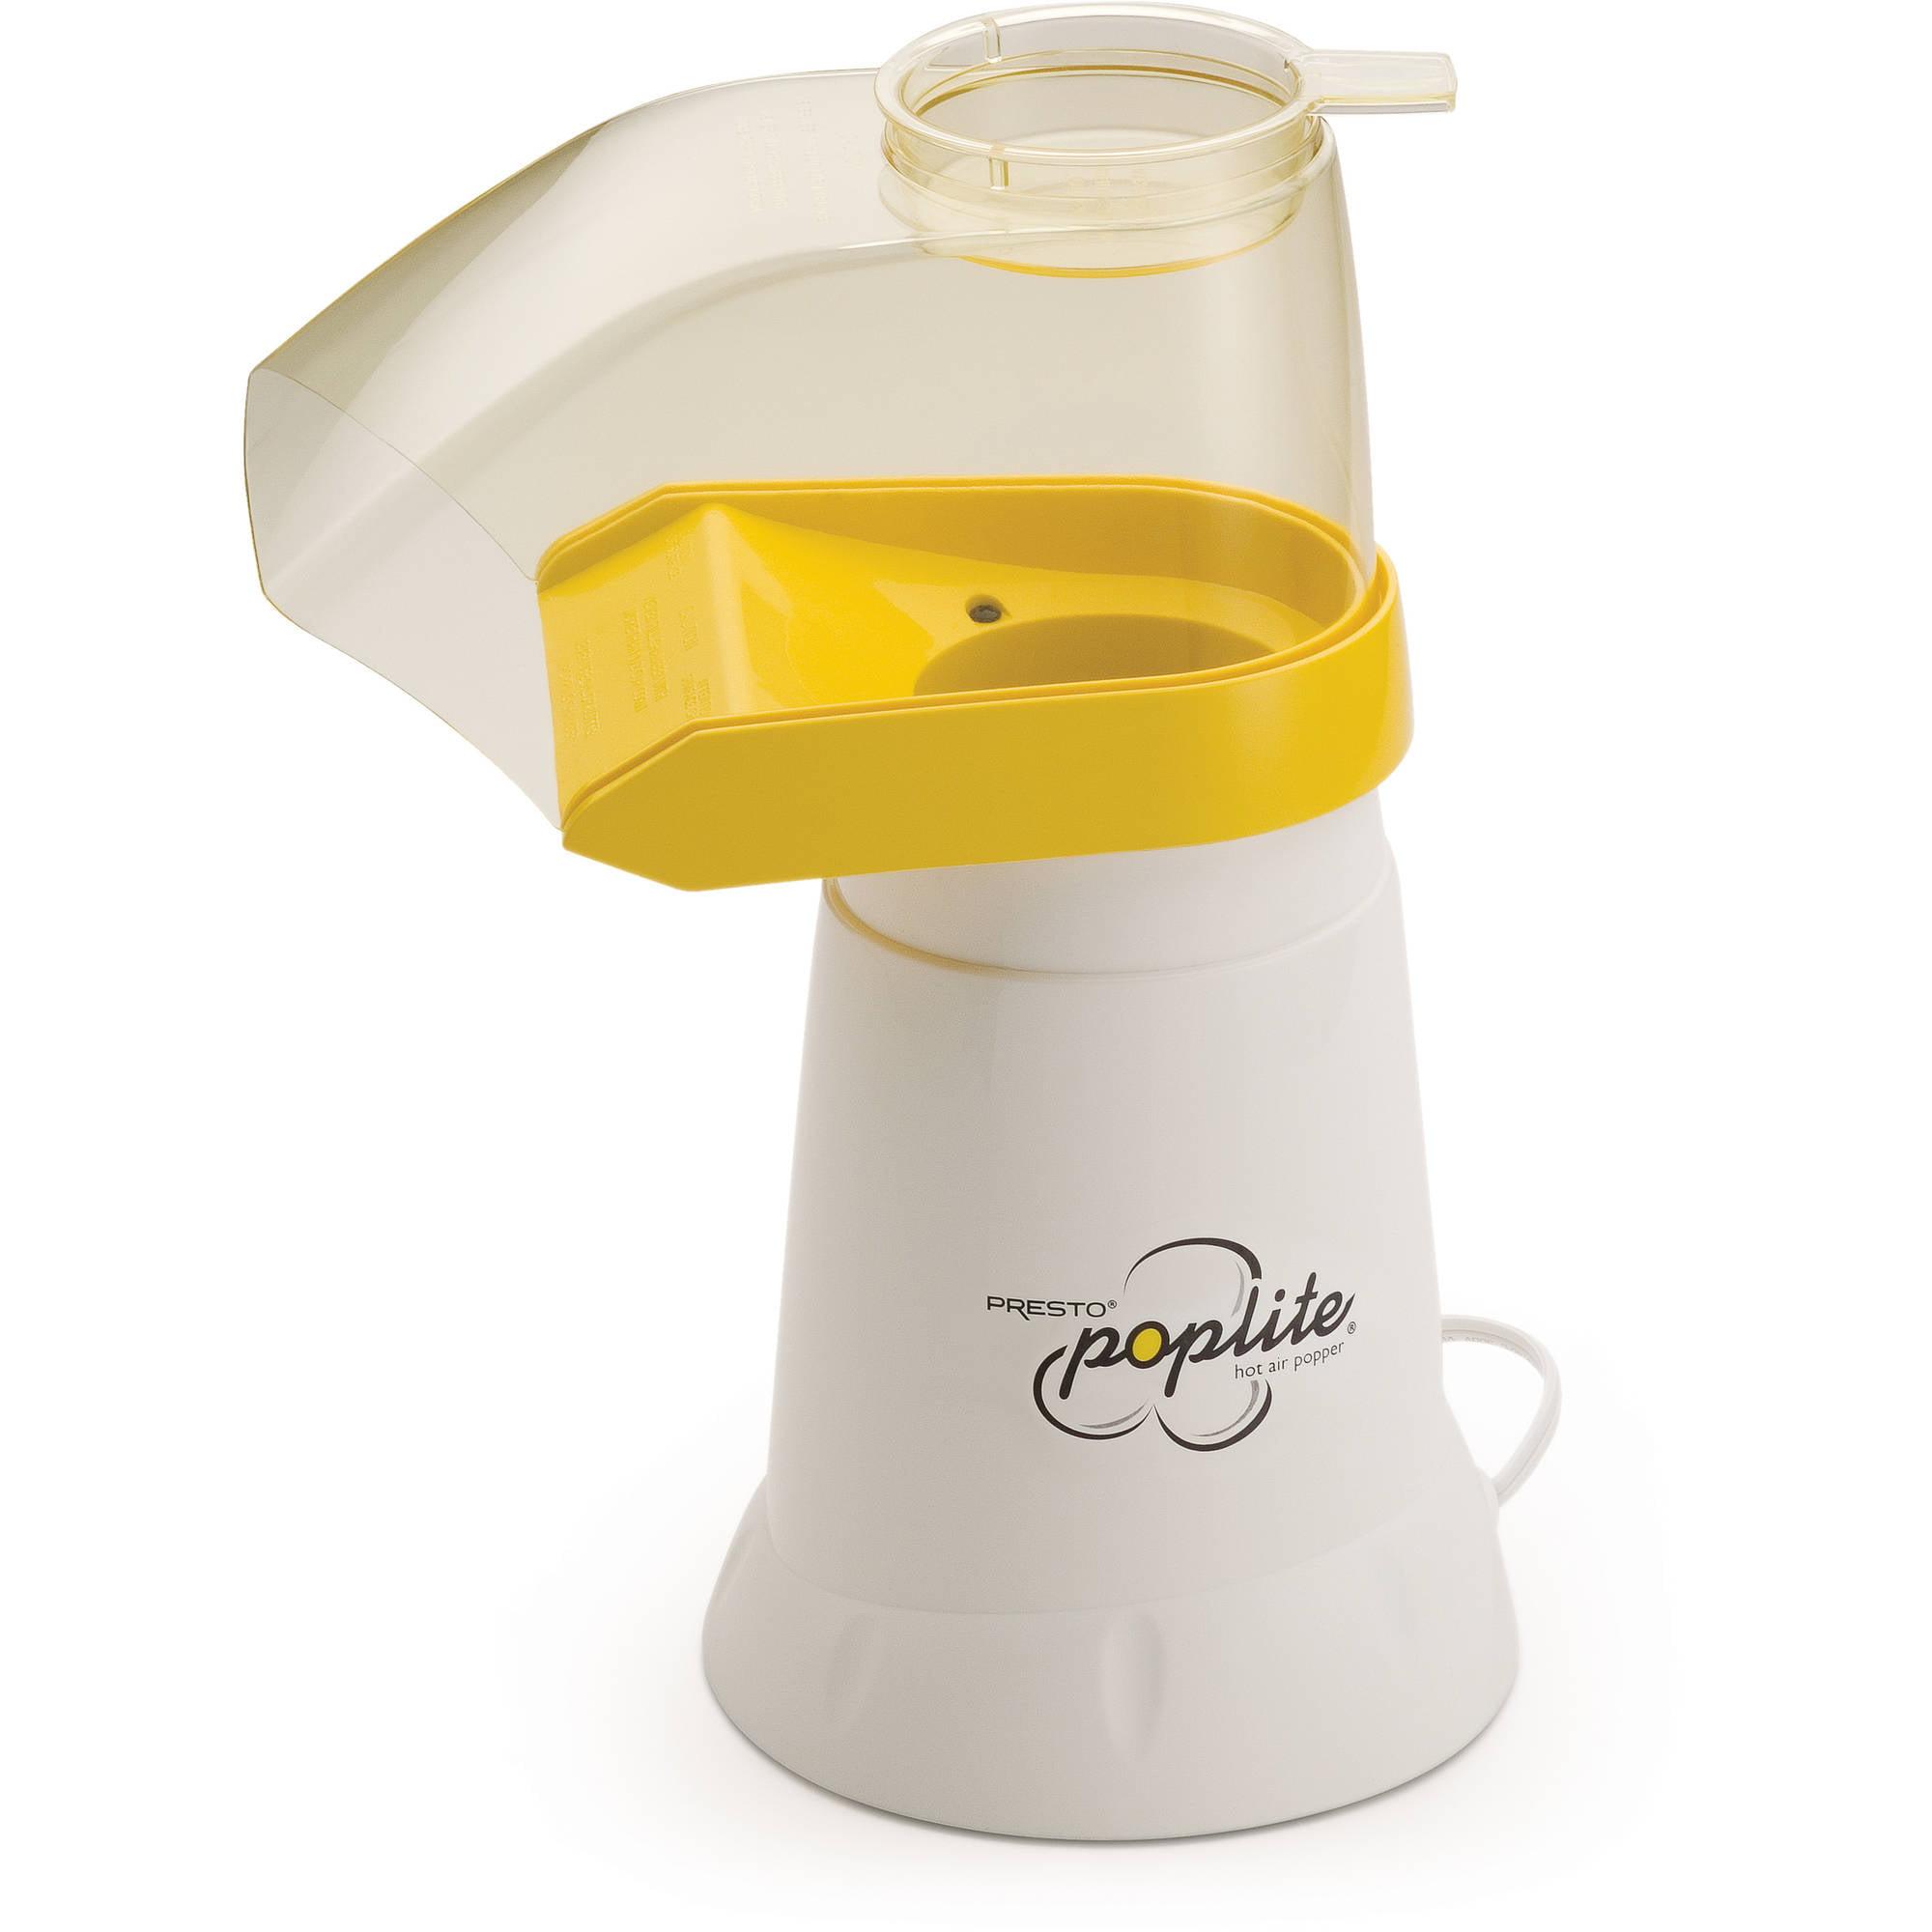 Presto 04820 Poplite Hot Air Popcorn Popper Maker New Kitchen Pop Corn